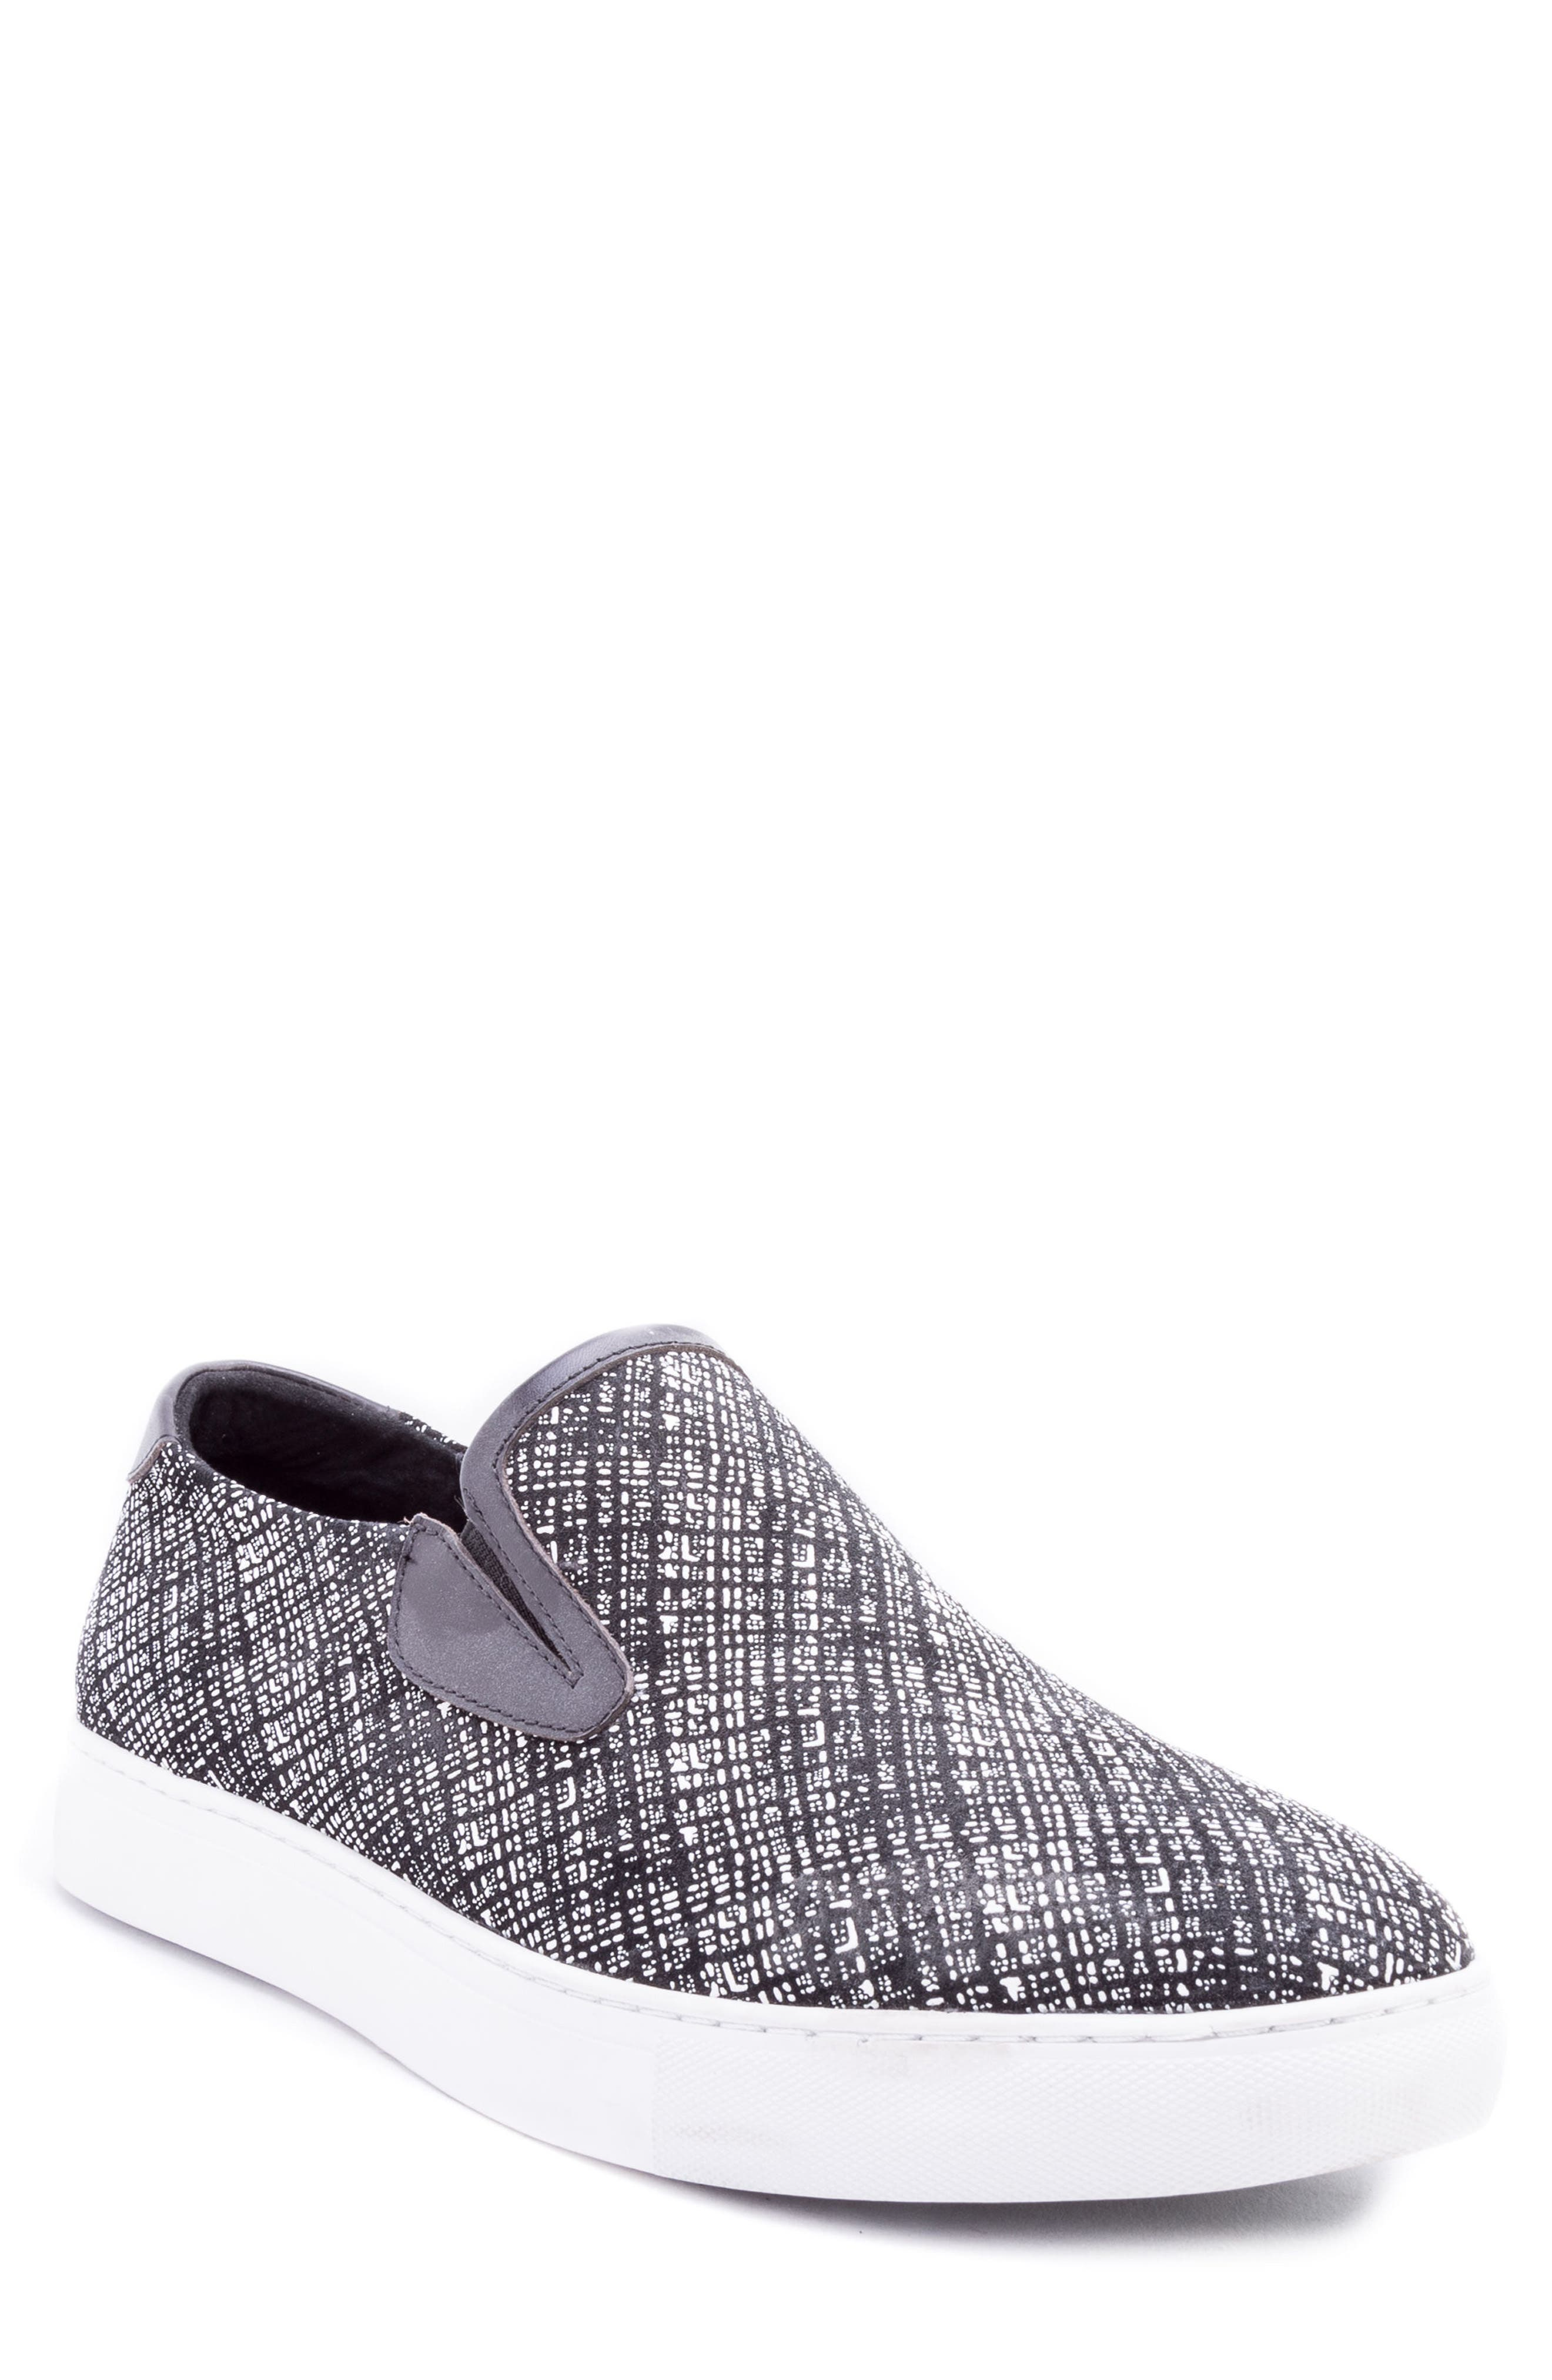 Kitson Slip-On Sneaker,                             Main thumbnail 1, color,                             BLACK SUEDE